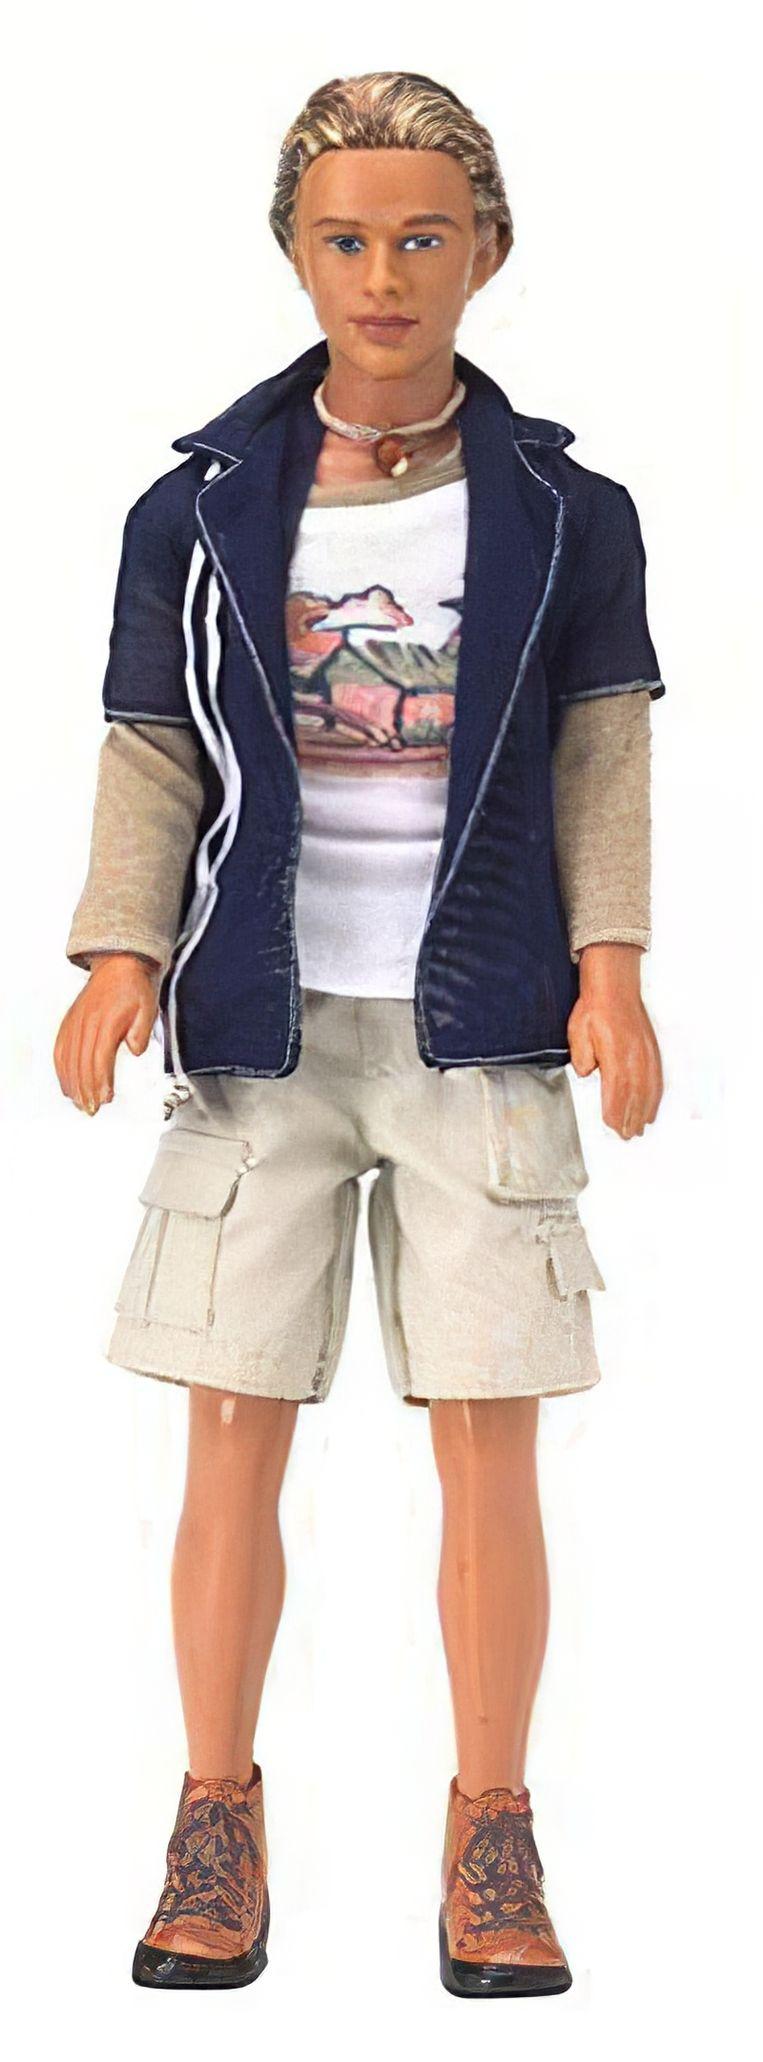 Blane, 2004 Beeld Mattel